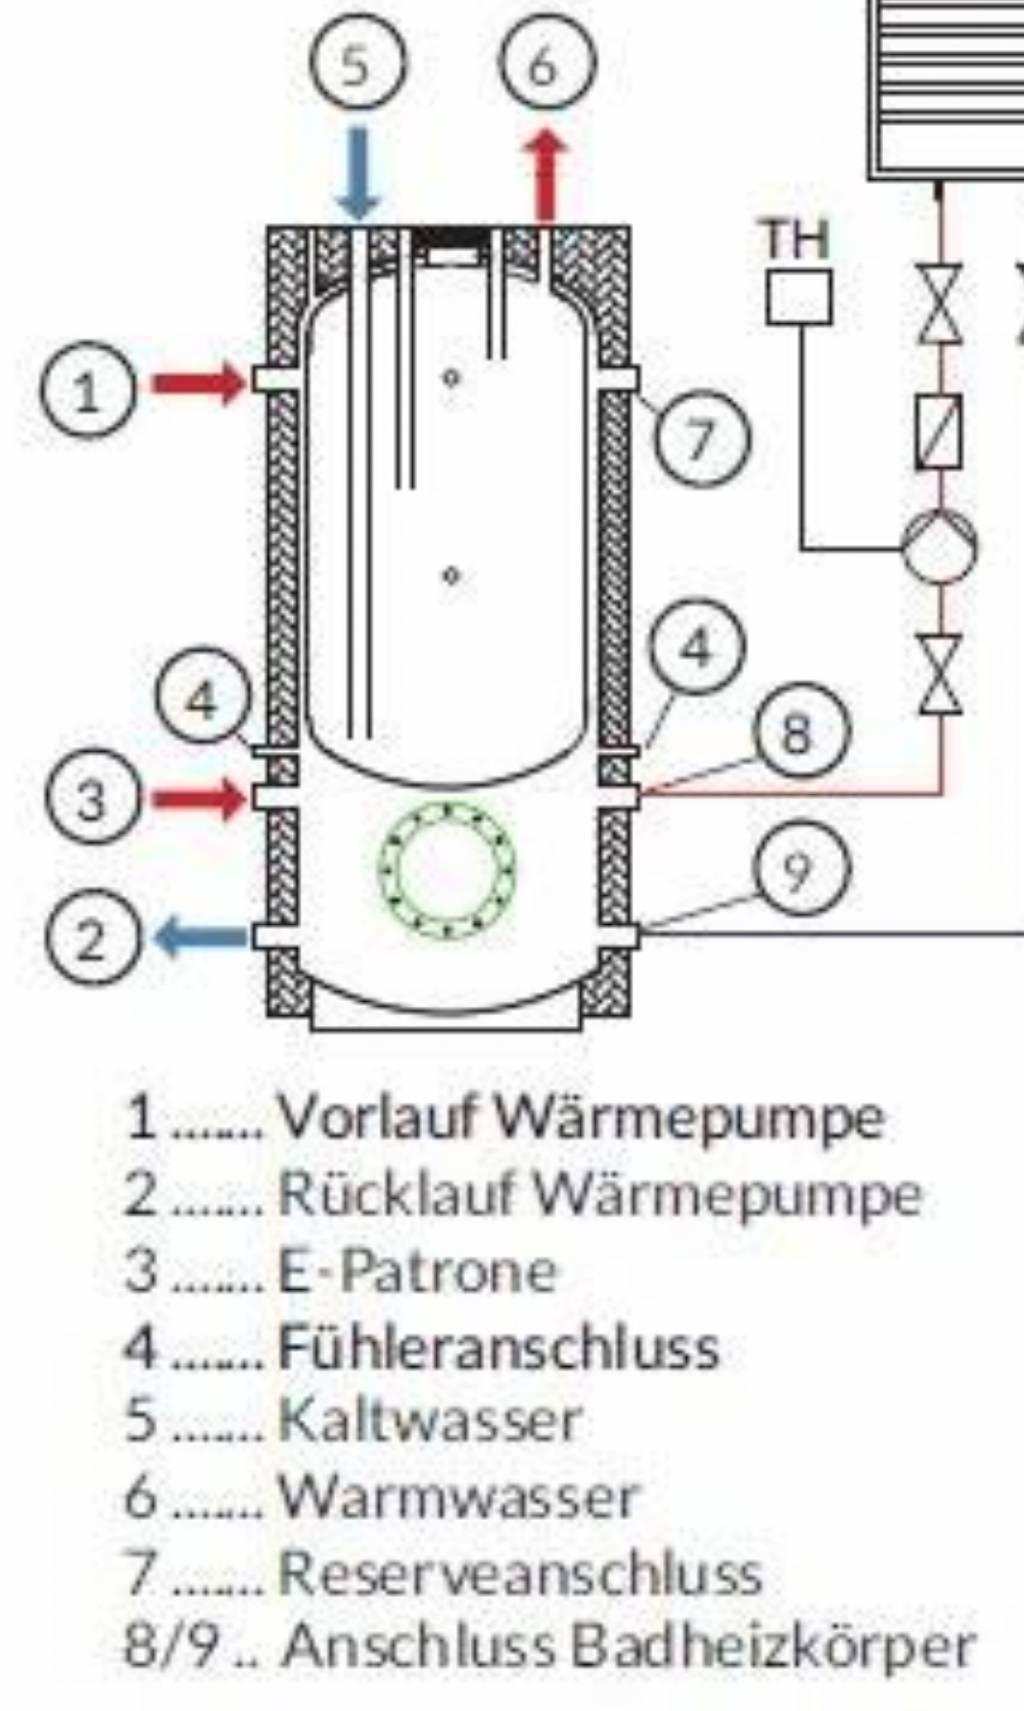 http://www.energiesparhaus.at/bilderupload2016/20160927191677.PNG